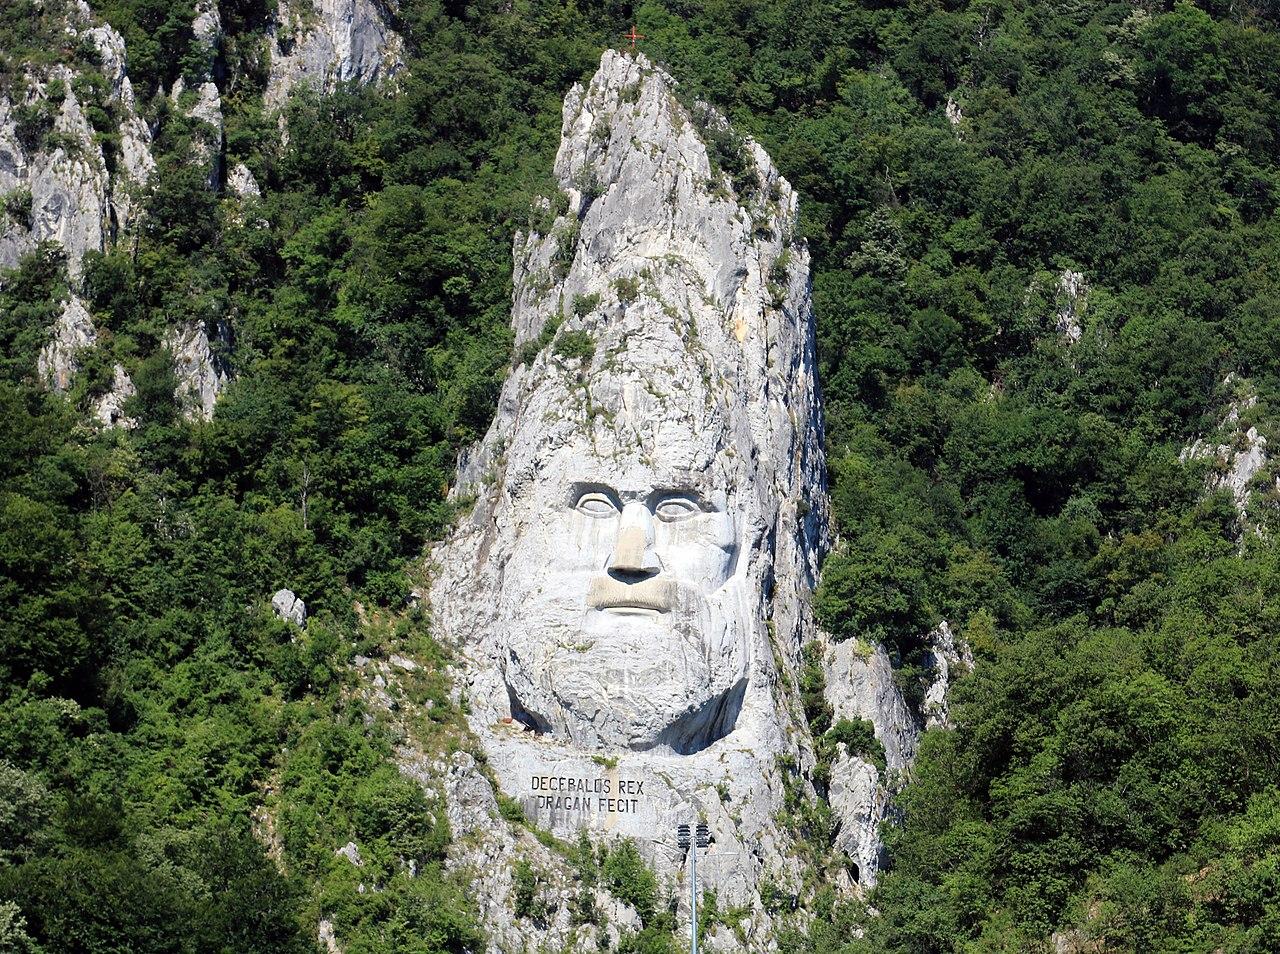 Rock sculpture of Decebalus5.jpg